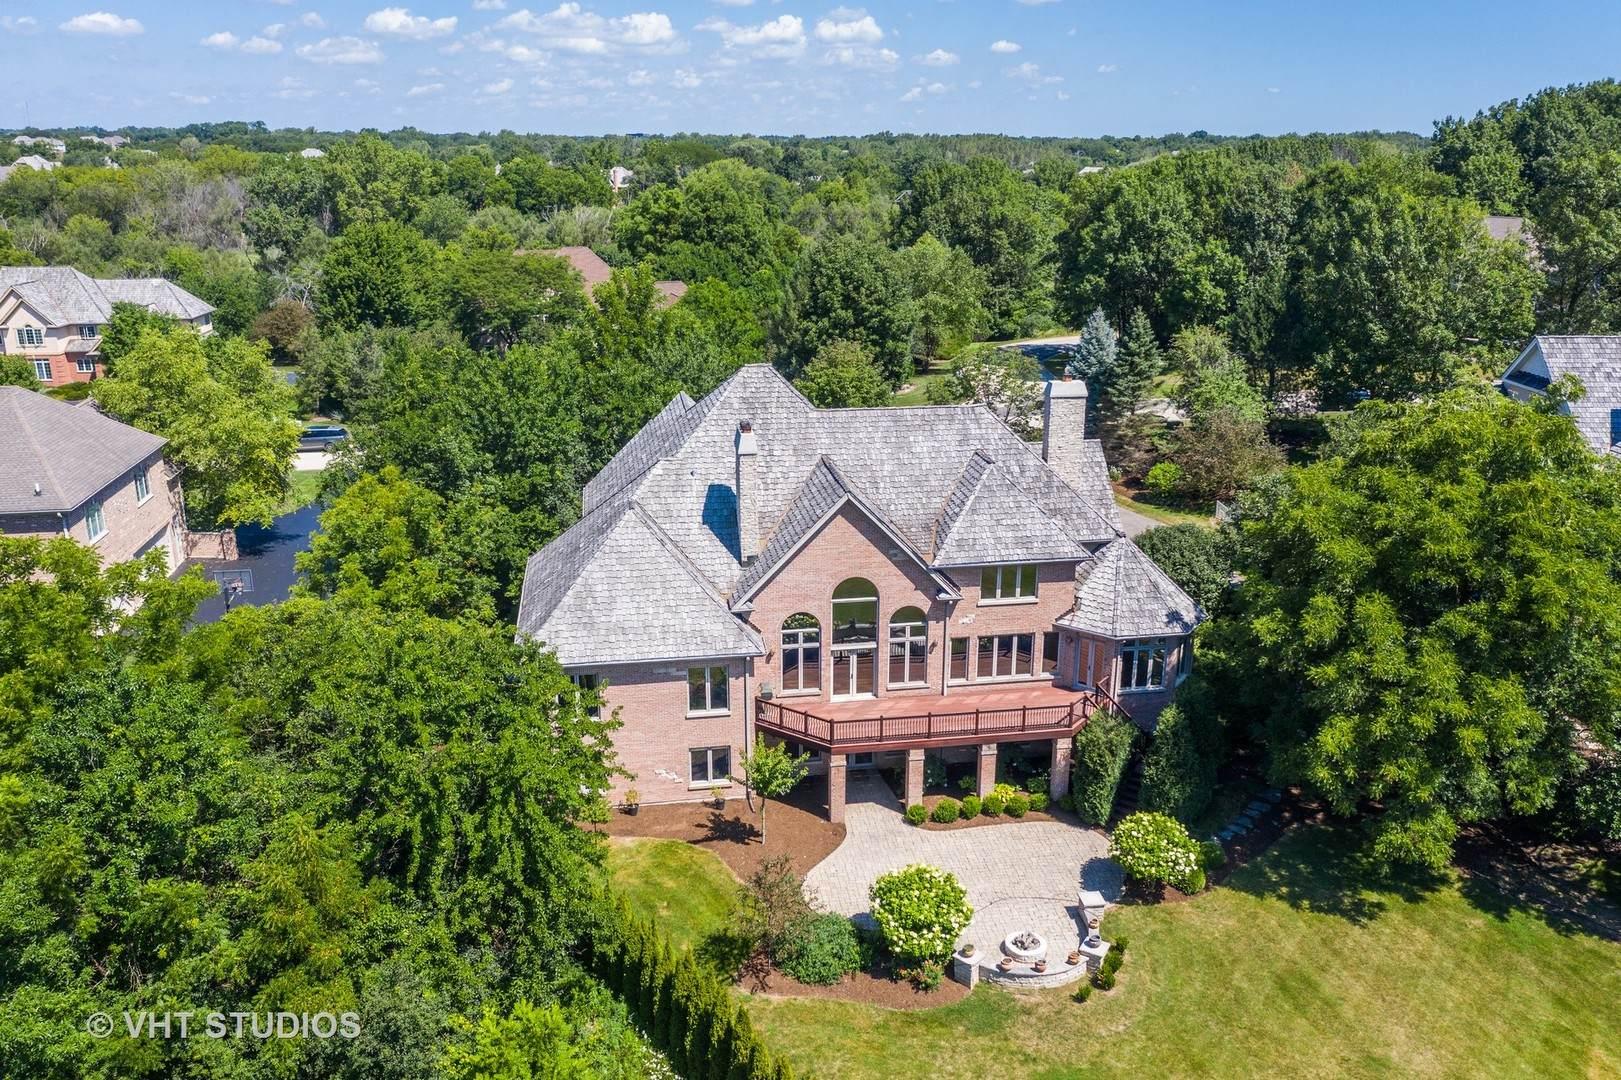 20817 W High Ridge Drive, Kildeer, IL 60047 (MLS #10890540) :: Helen Oliveri Real Estate